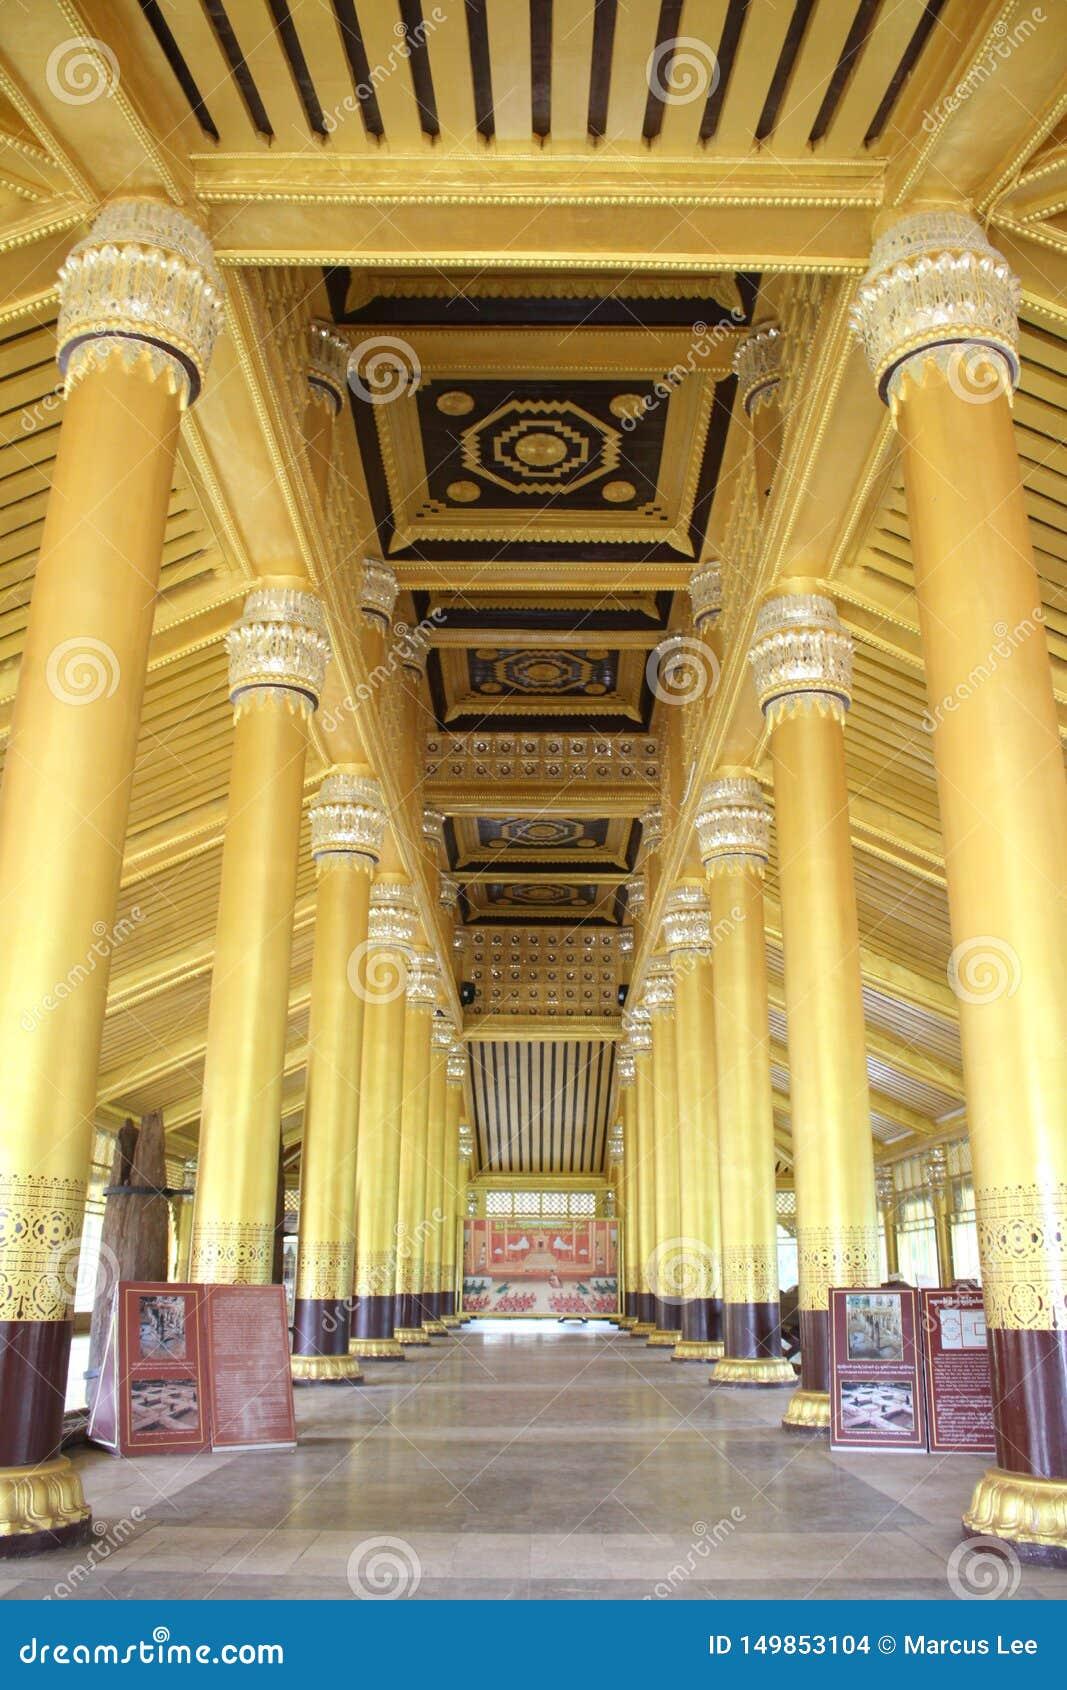 Kanbawza Thadi Golden Palace Bago yagoon, myanmar Burma